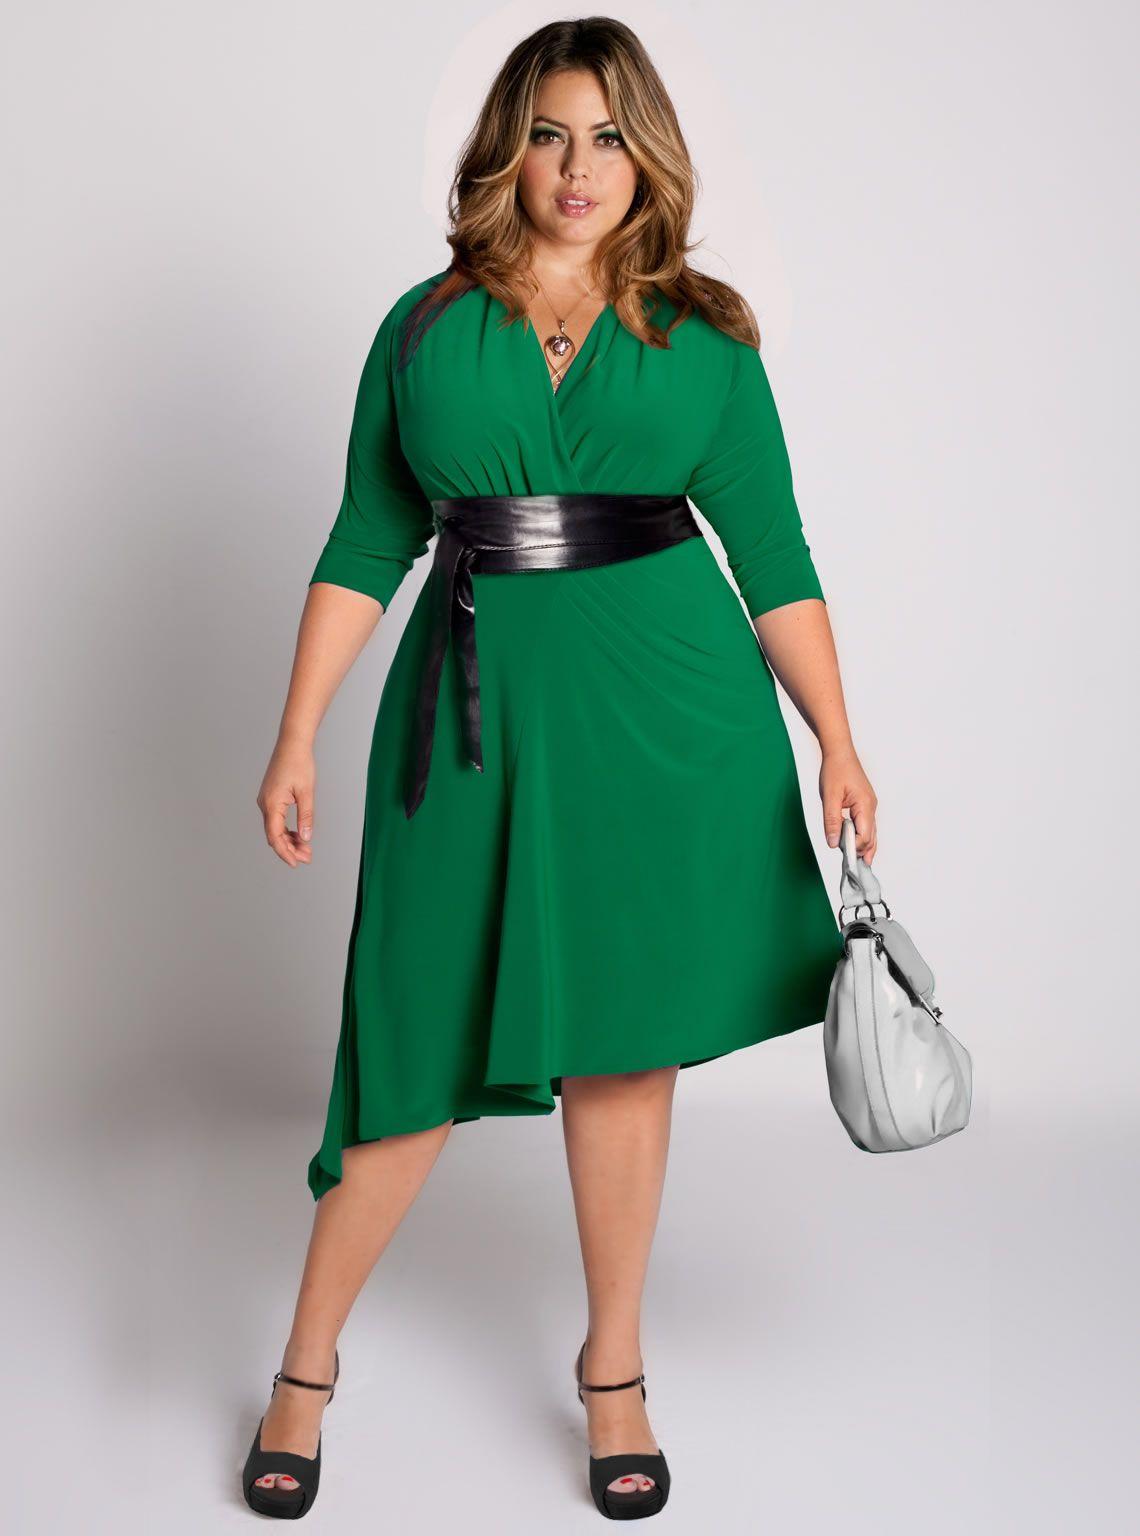 Black denim overall dress plus size